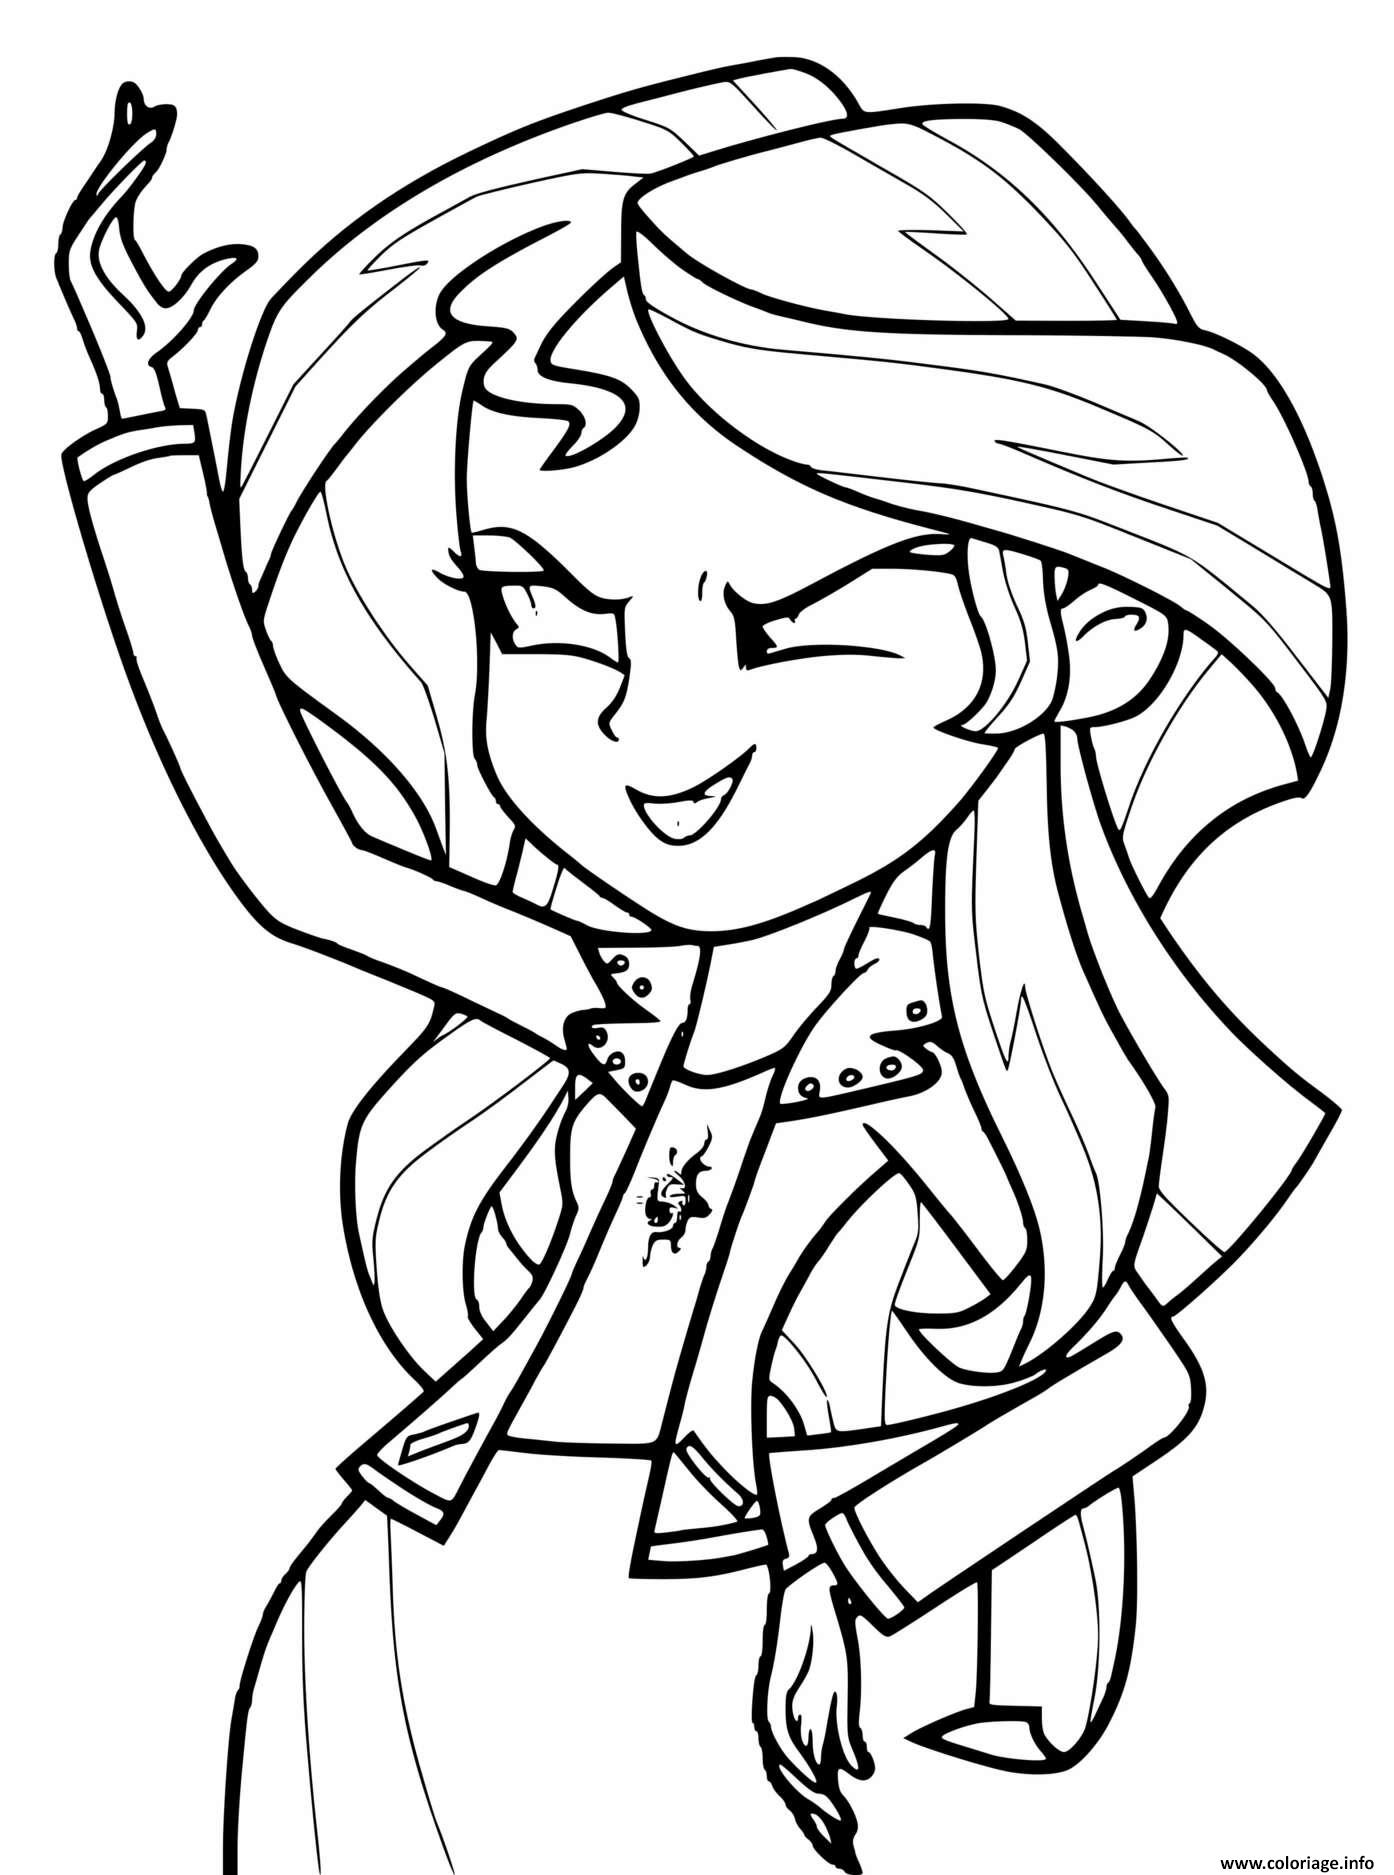 Dessin Sunset Shimmer My Little Pony Girl Coloriage Gratuit à Imprimer